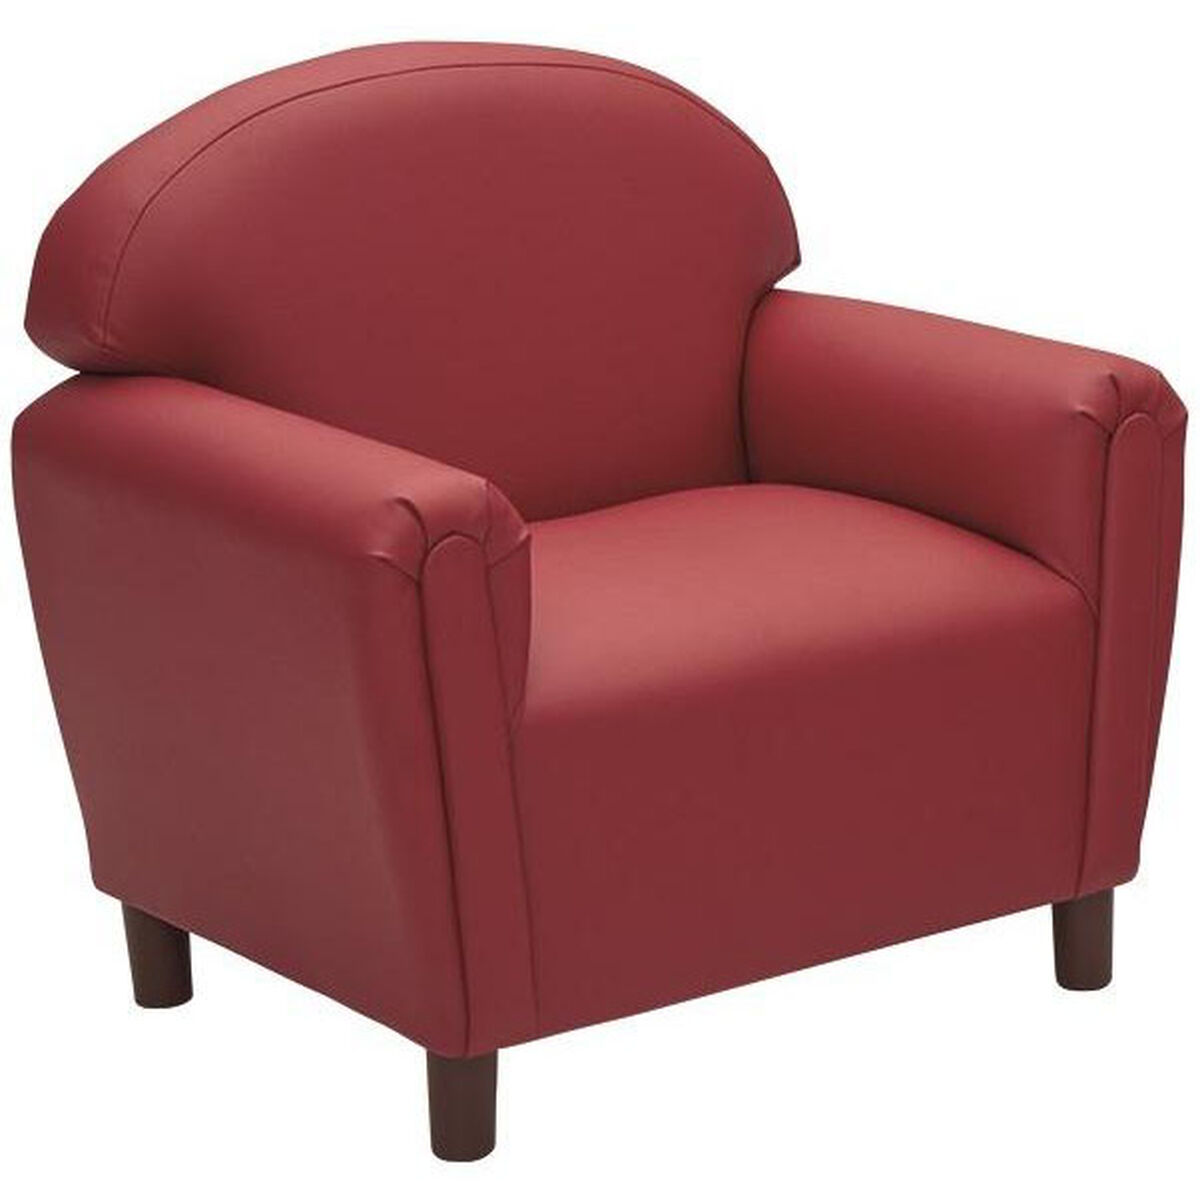 Red School Age Chair FS0210-200 | Bizchair.com